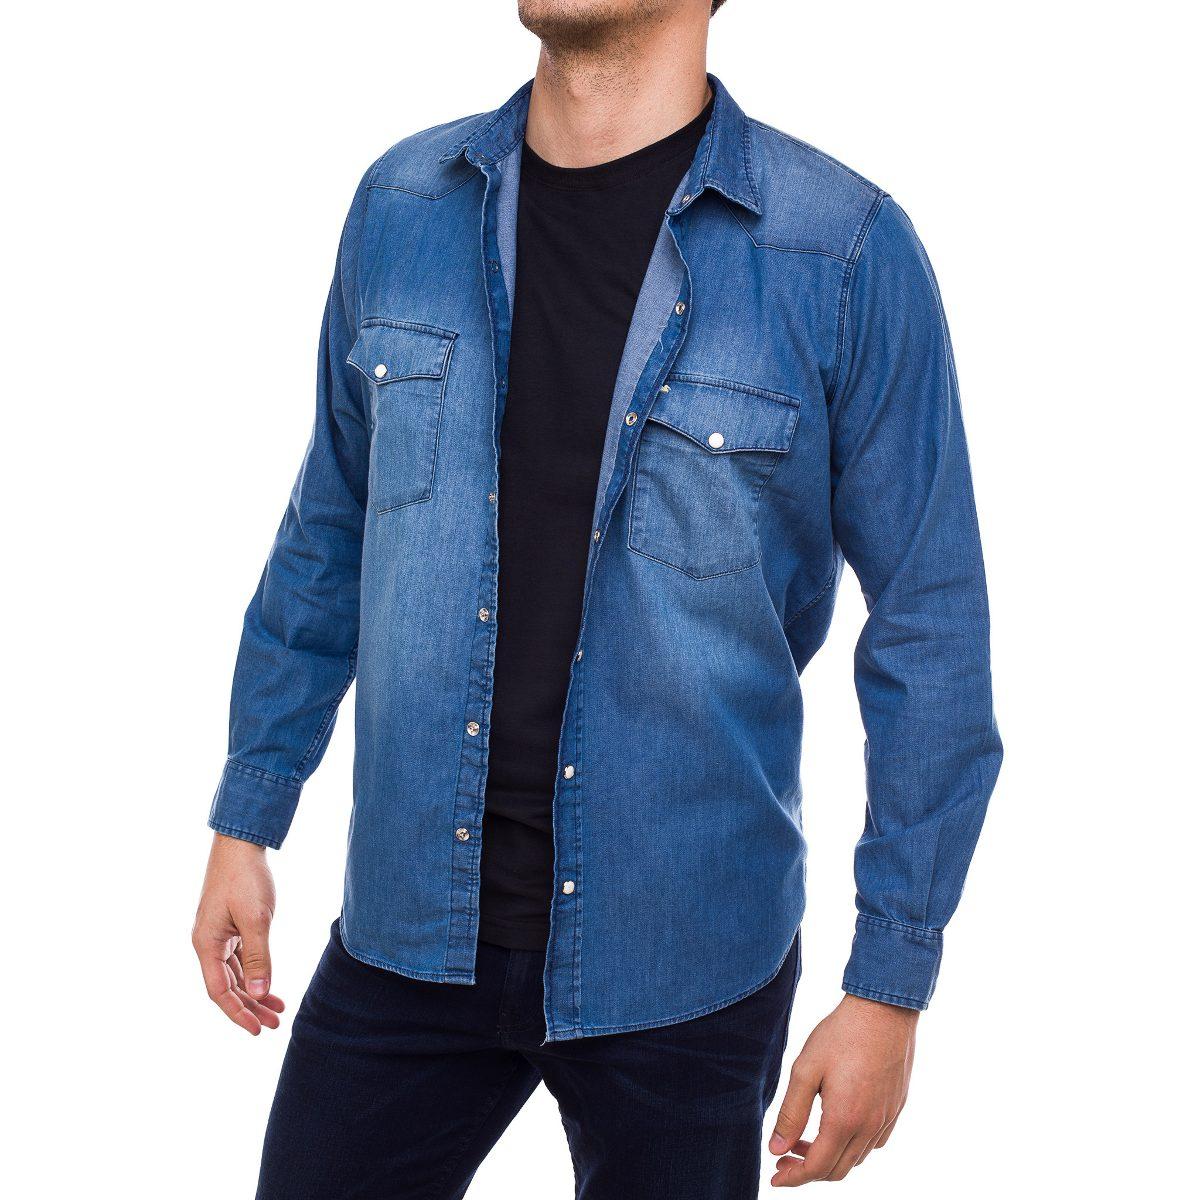 6f7b200f6308c camisa de jean hombre pato pampa celeste. Cargando zoom.